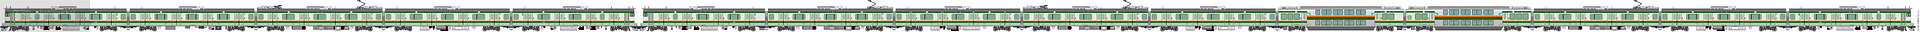 Train 1953